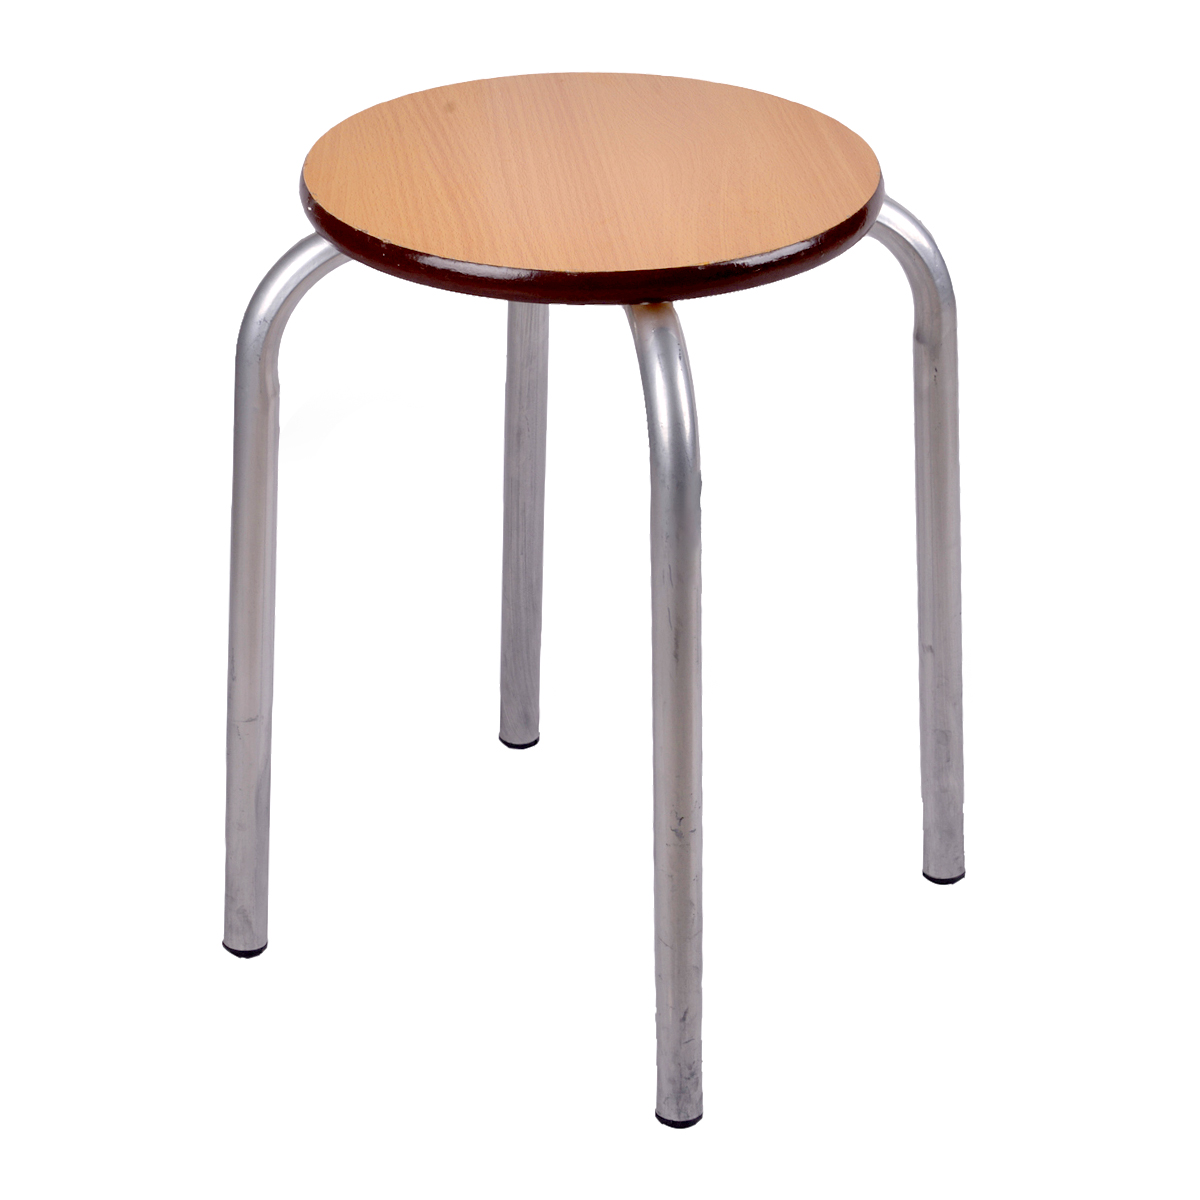 كرسي حديد خشب مقعد15205